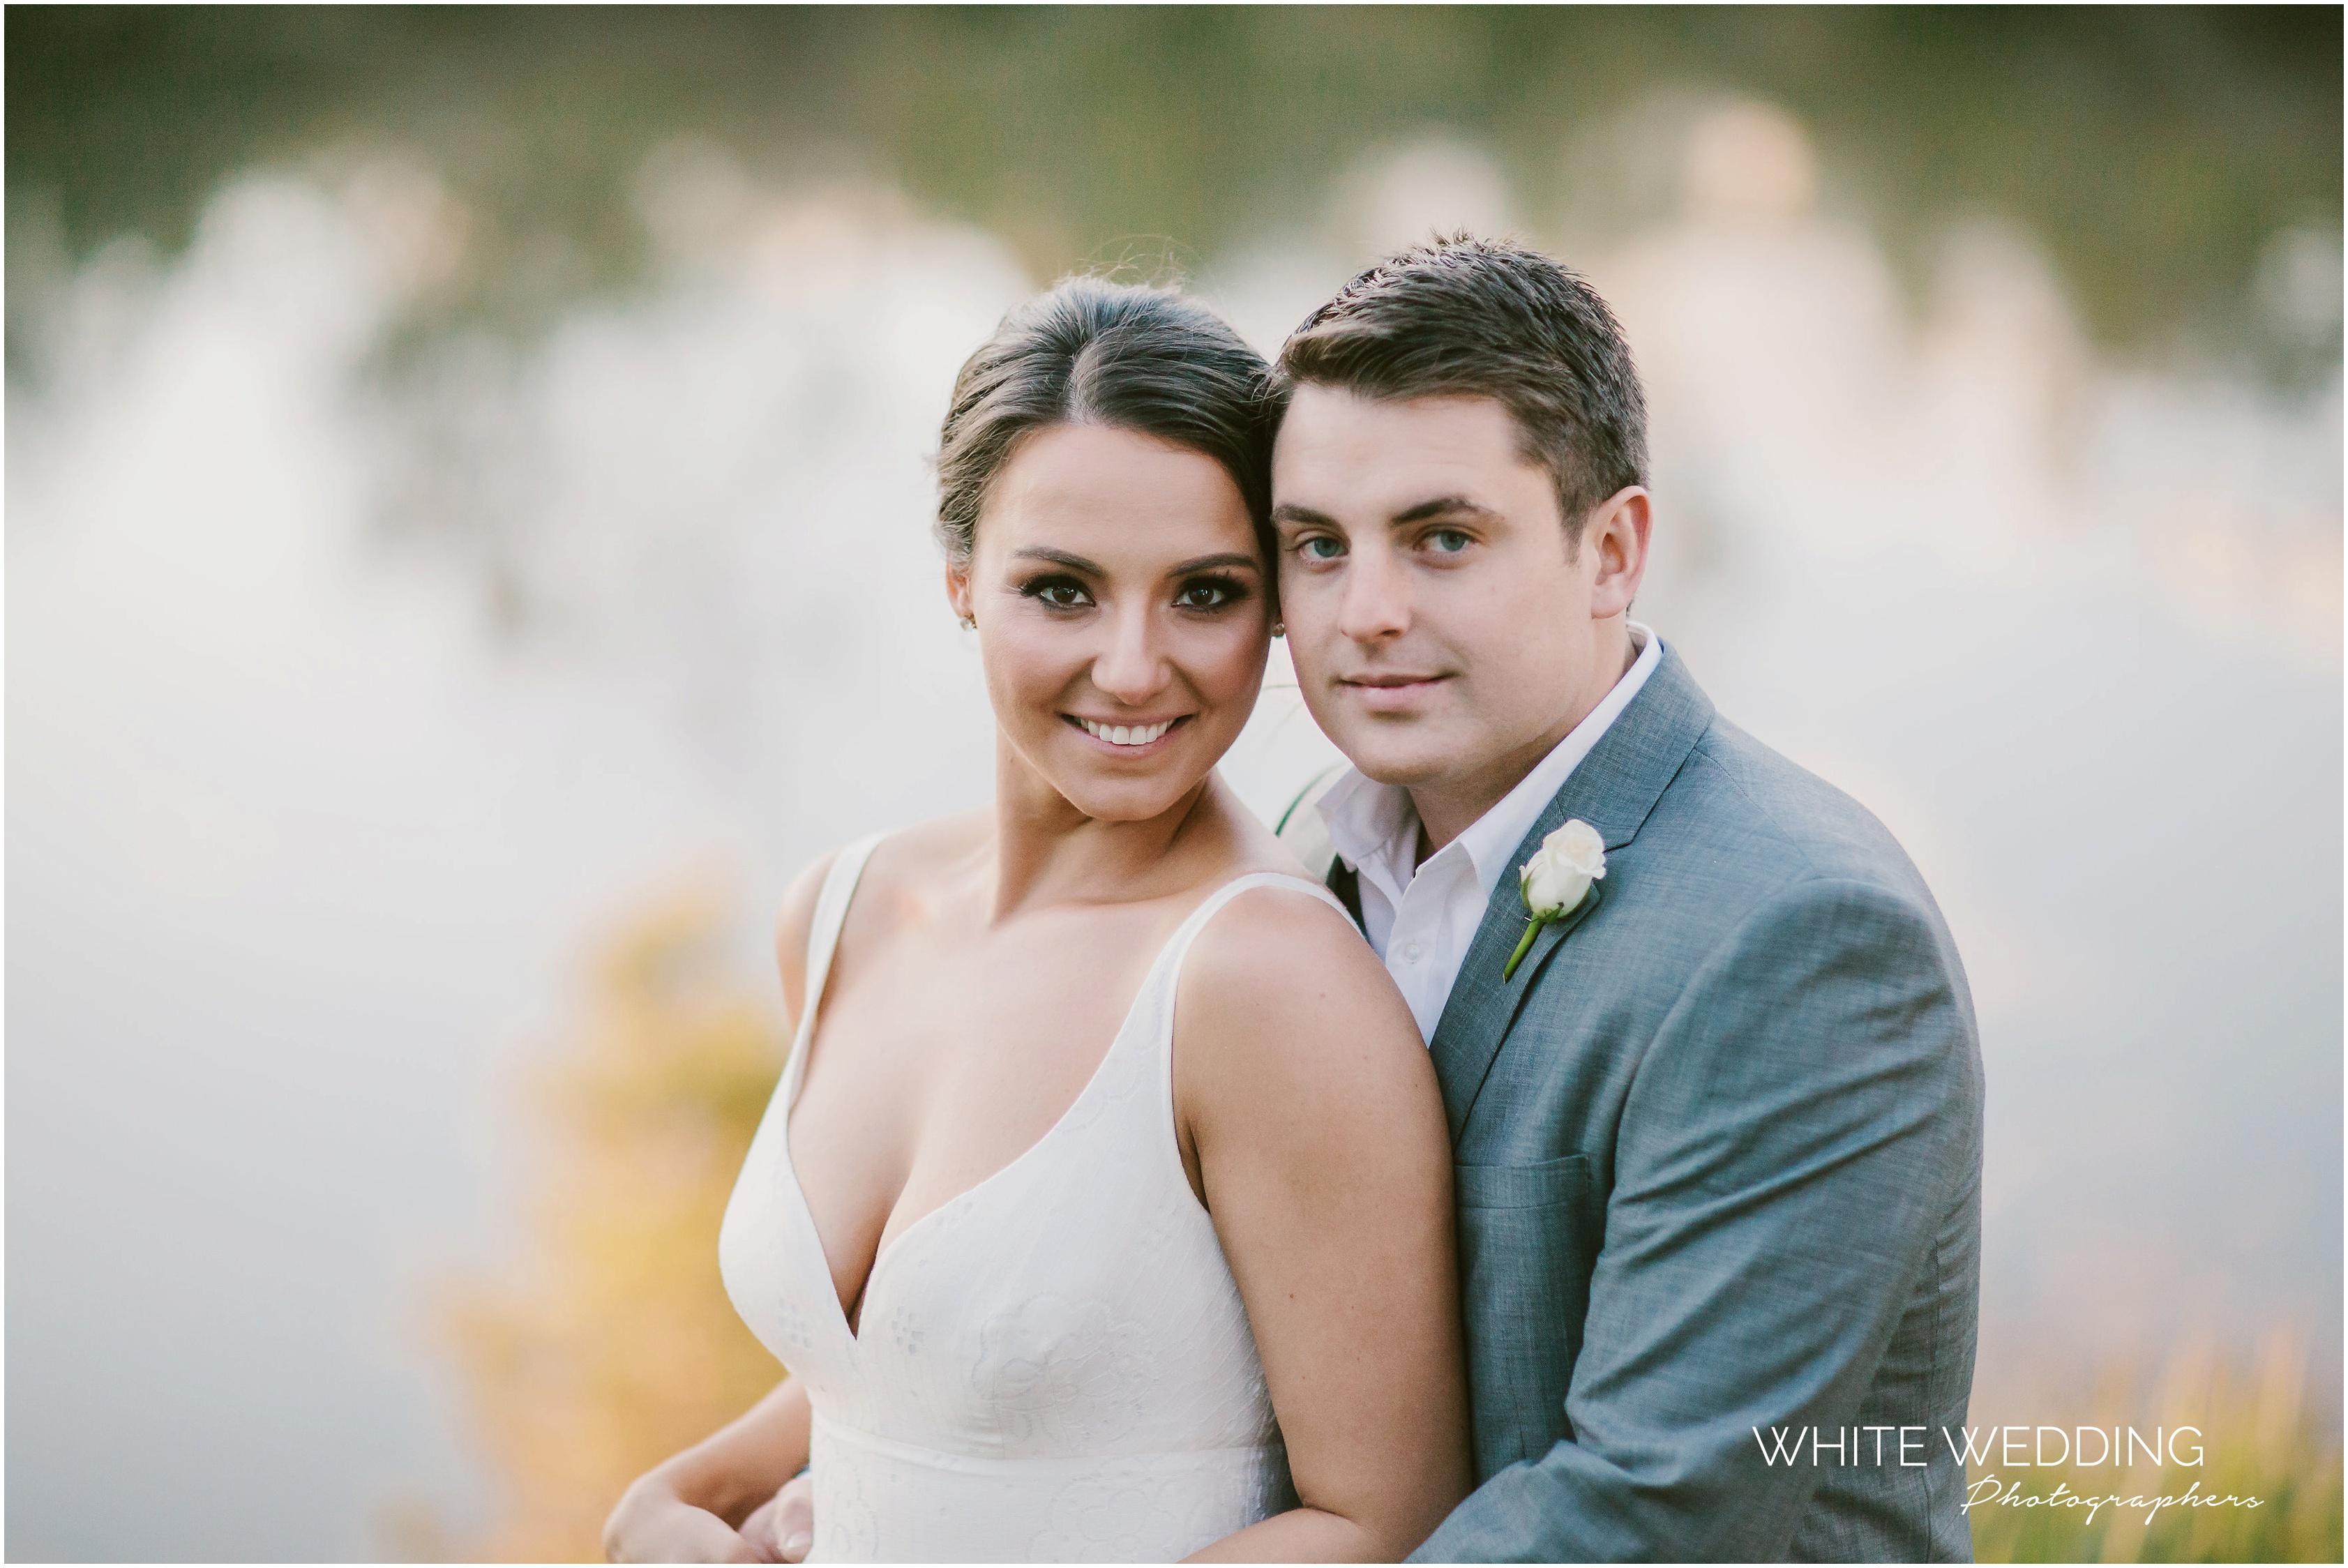 Luke padwick wedding